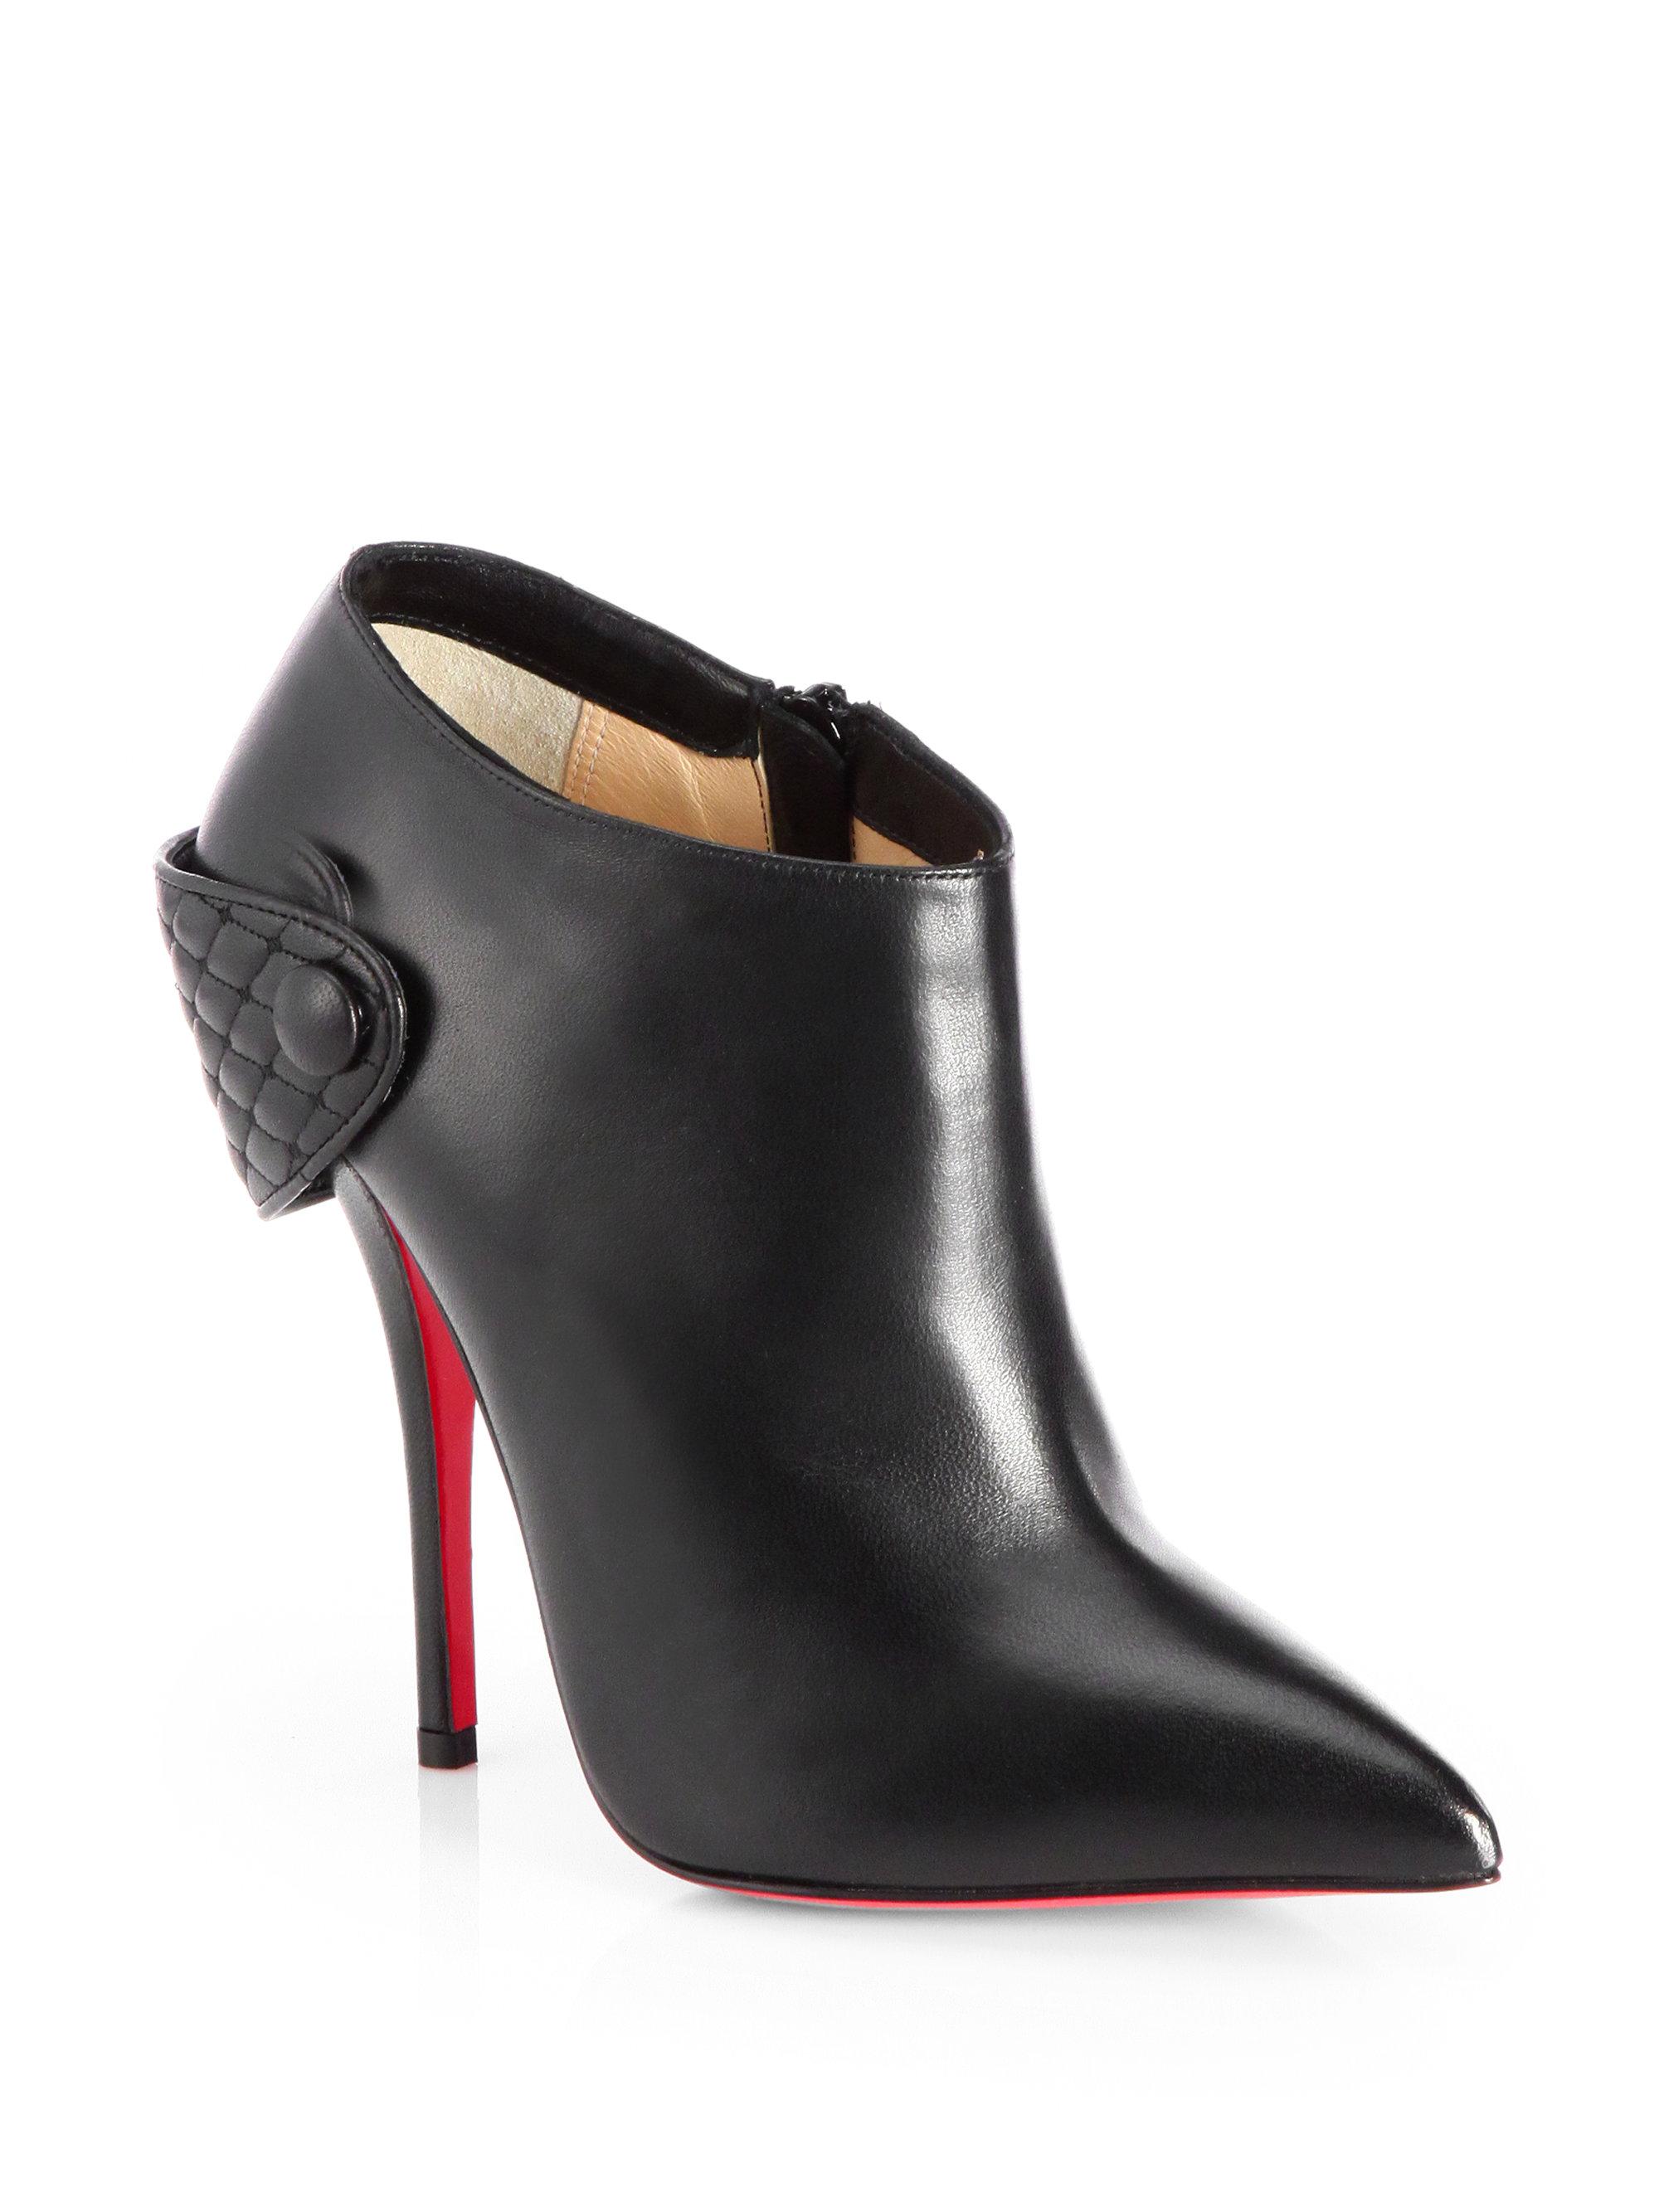 christian louboutin boots fall 2013 - Bavilon Salon